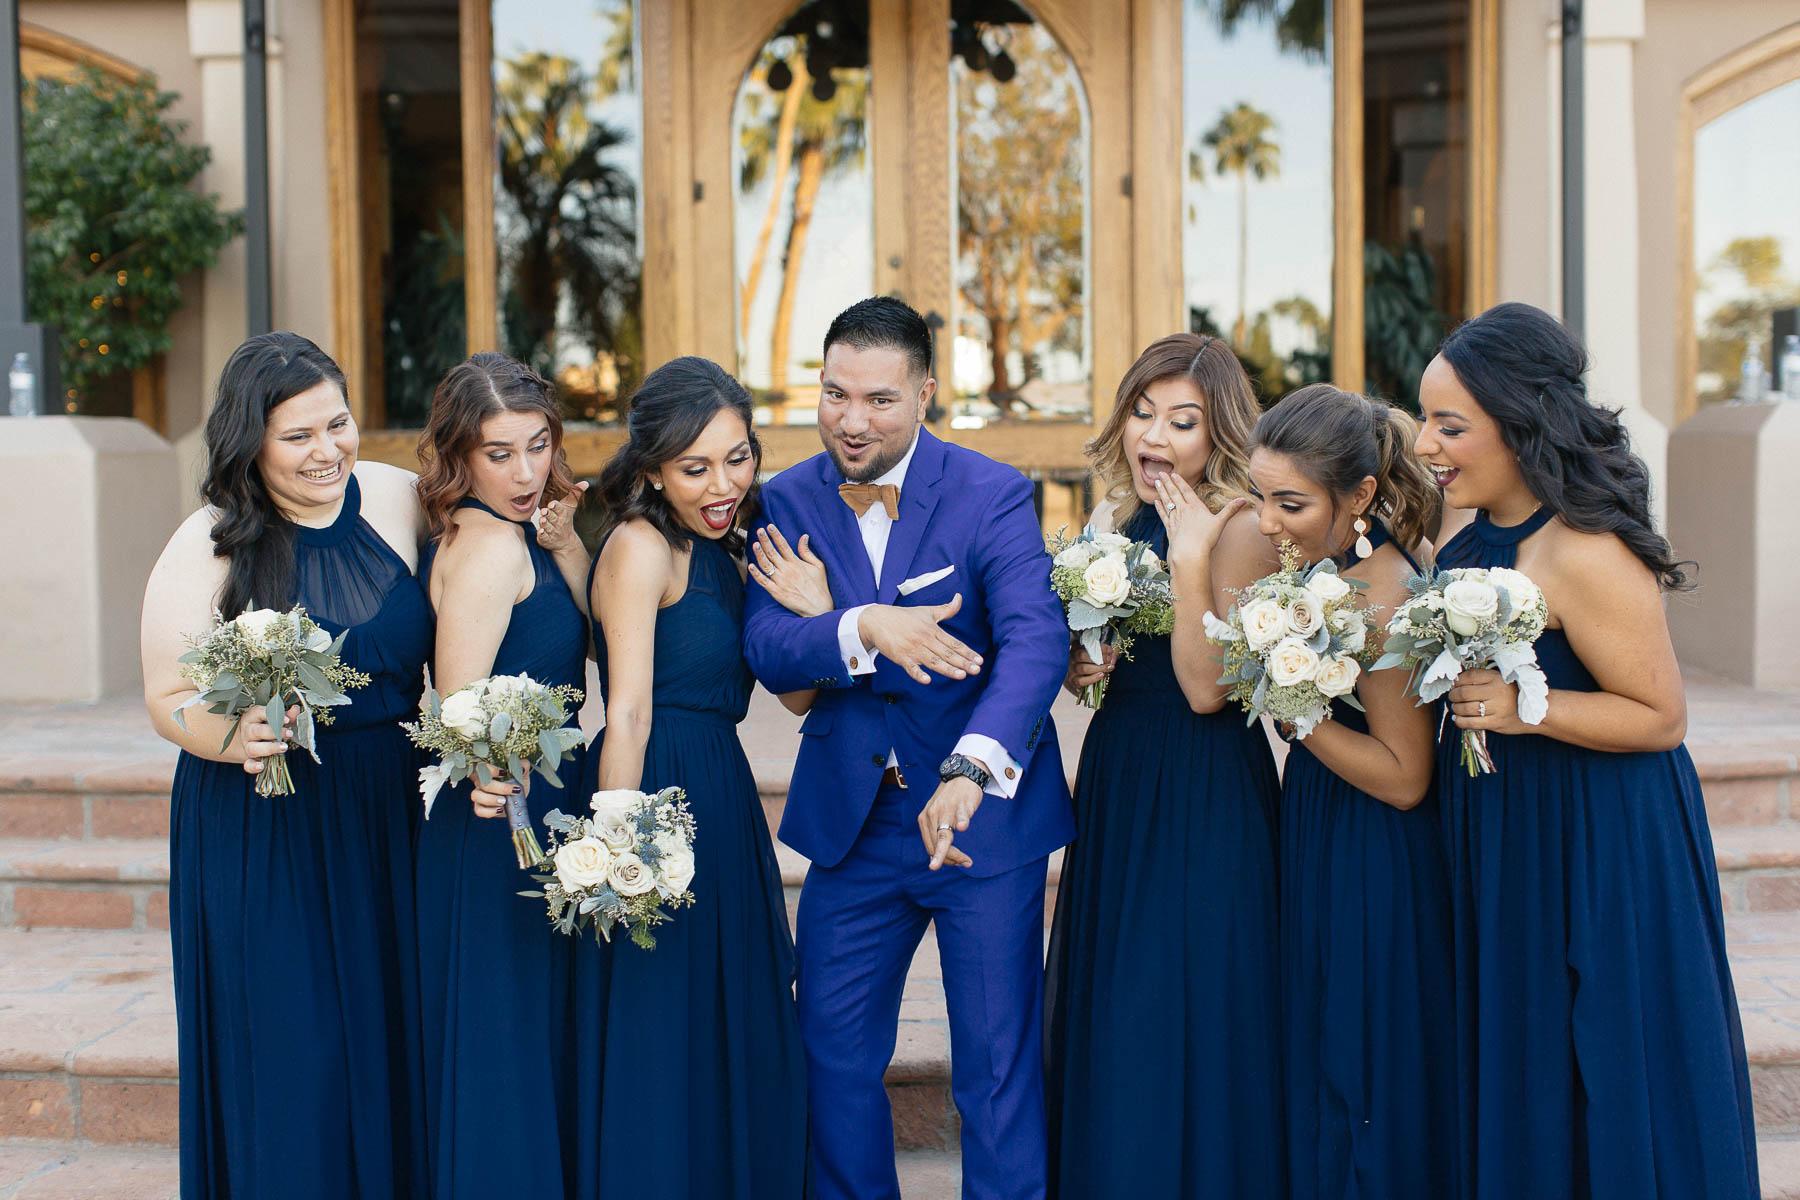 161029-Luxium-Weddings-Arizona-Jeff-Griselda-First-Look-Val-Vista-Lakes-Gilber-049.jpg